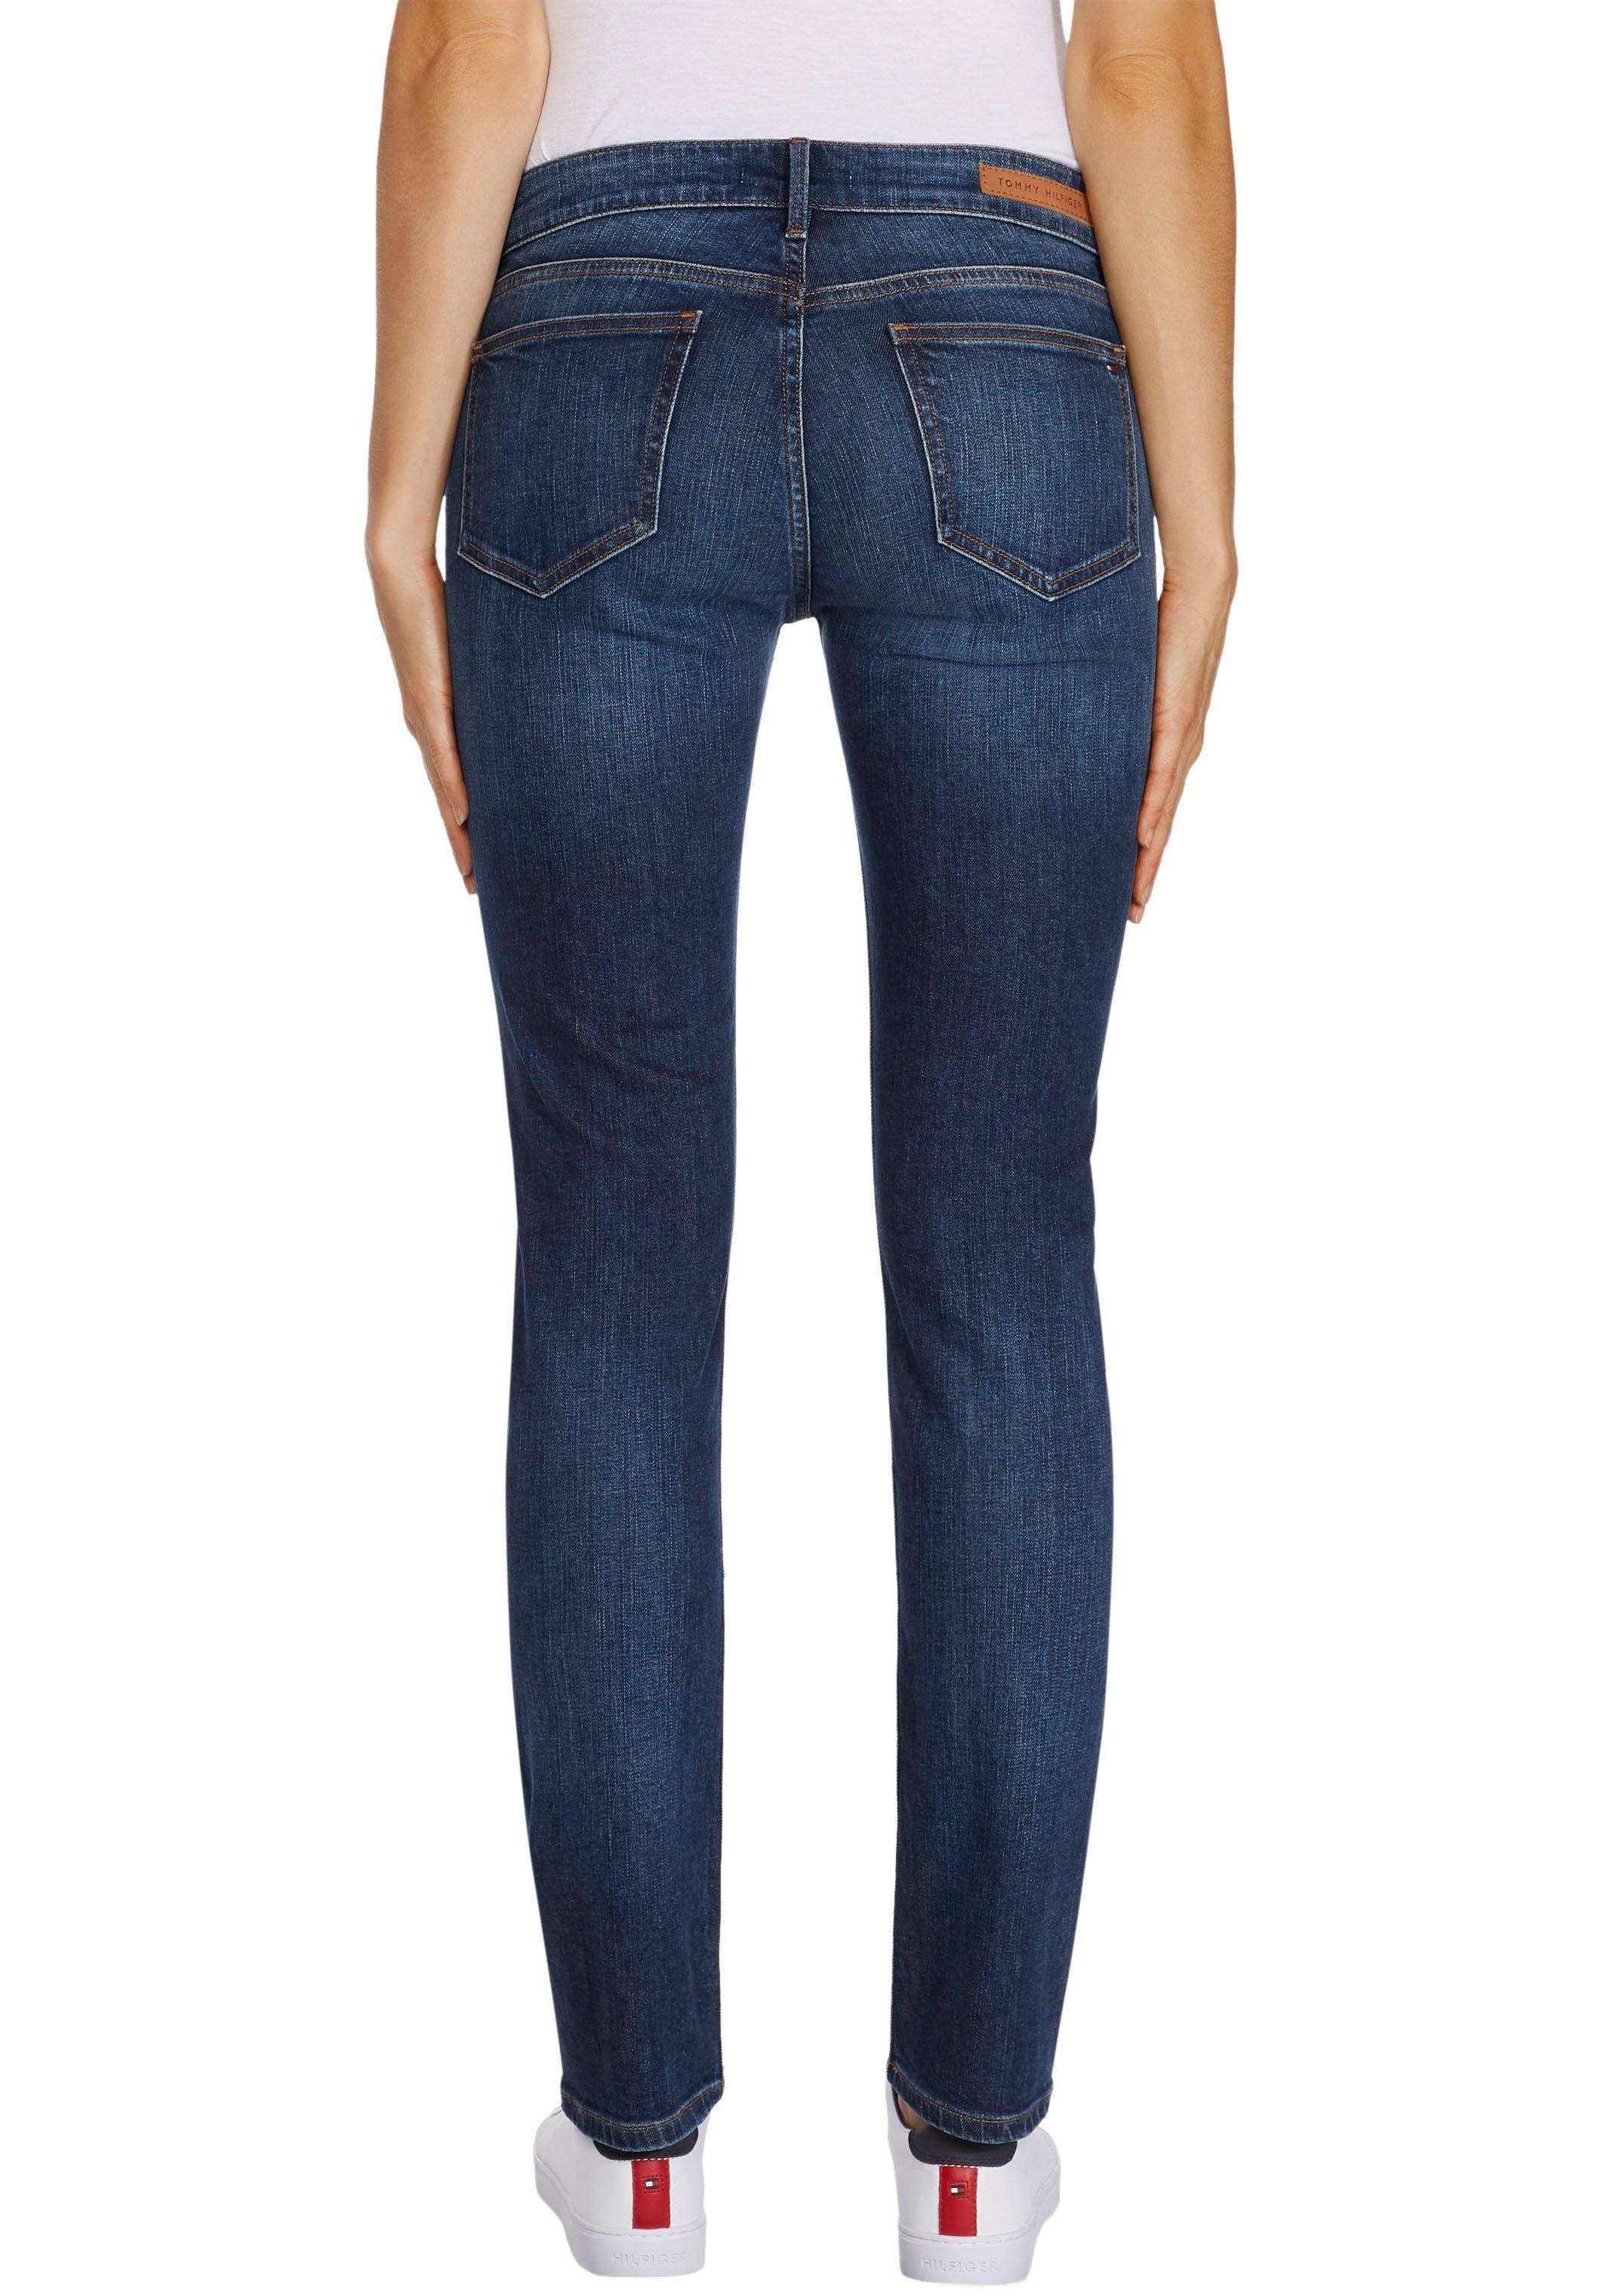 TOMMY HILFIGER slim fit jeans »HERITAGE MILAN SLIM LW« bij OTTO online kopen